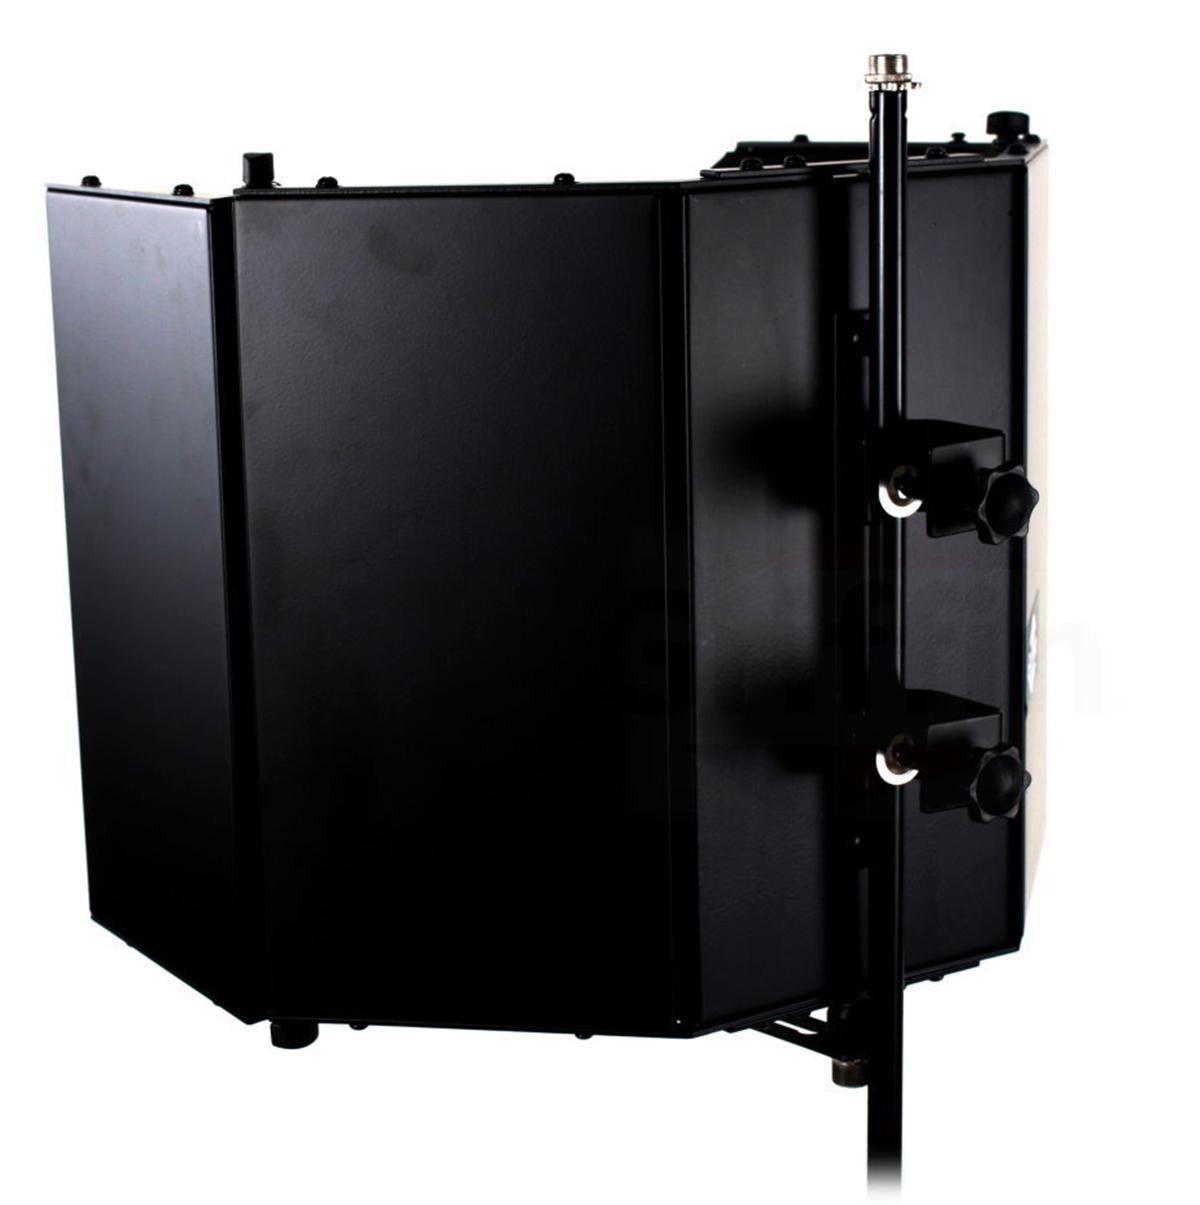 studio microphone diffuser isolation sound absorber foam panel shield stand mic 609132683916 ebay. Black Bedroom Furniture Sets. Home Design Ideas